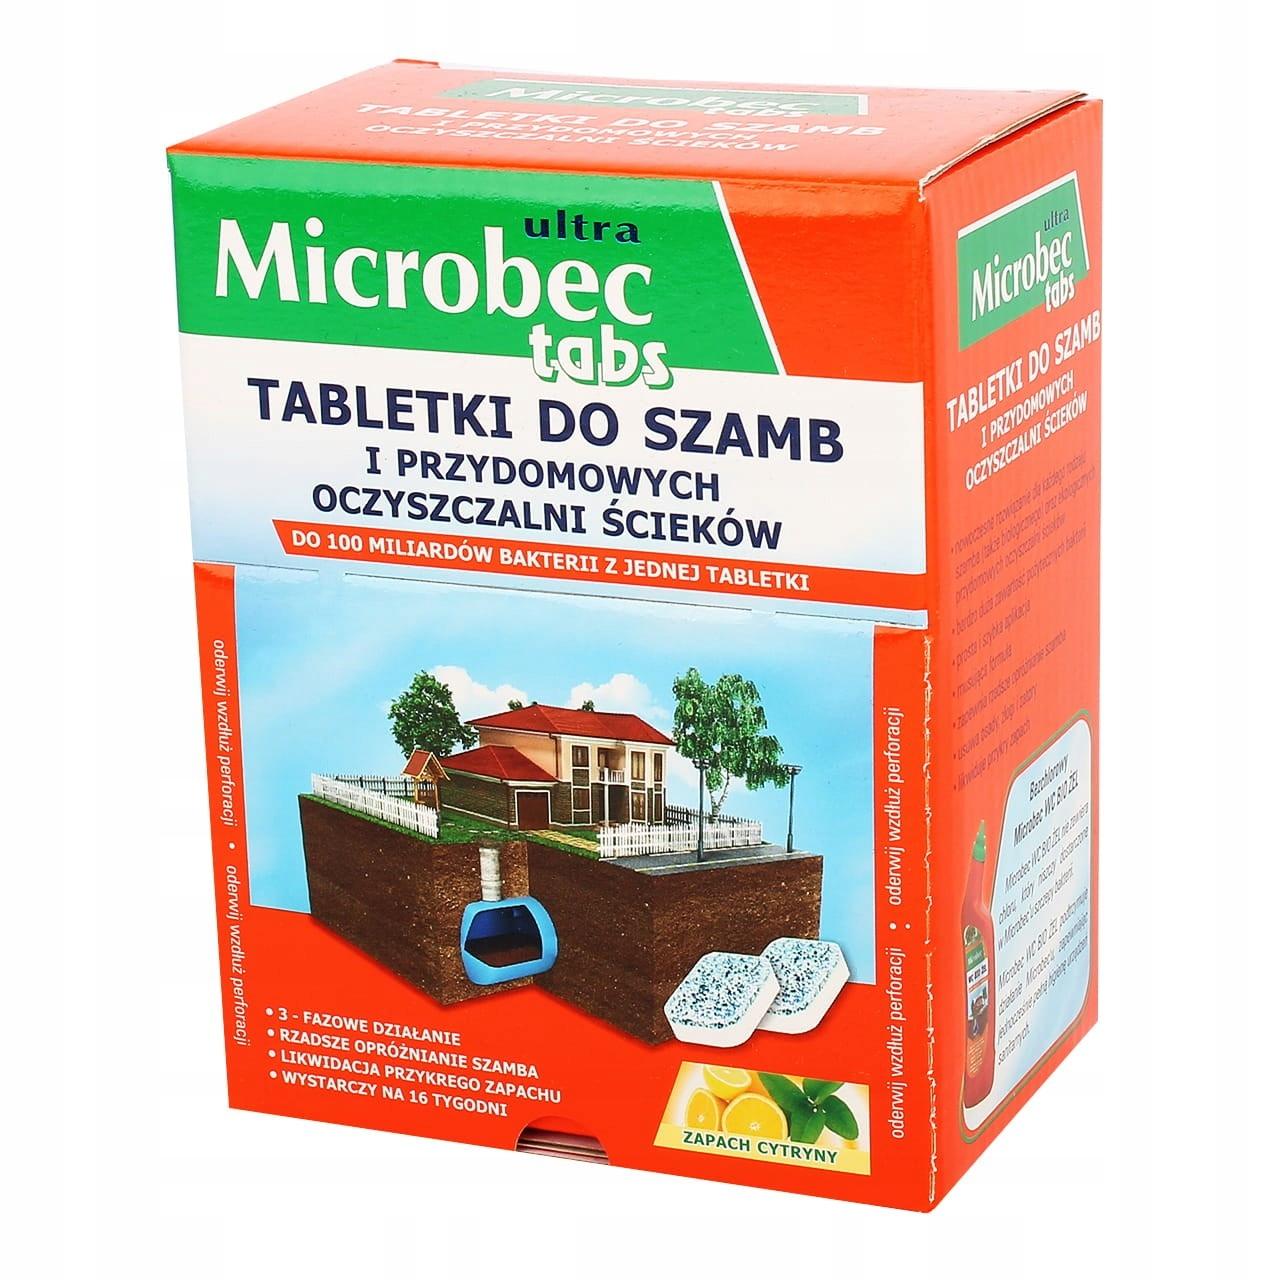 Септики Microbec ultra 16x20g